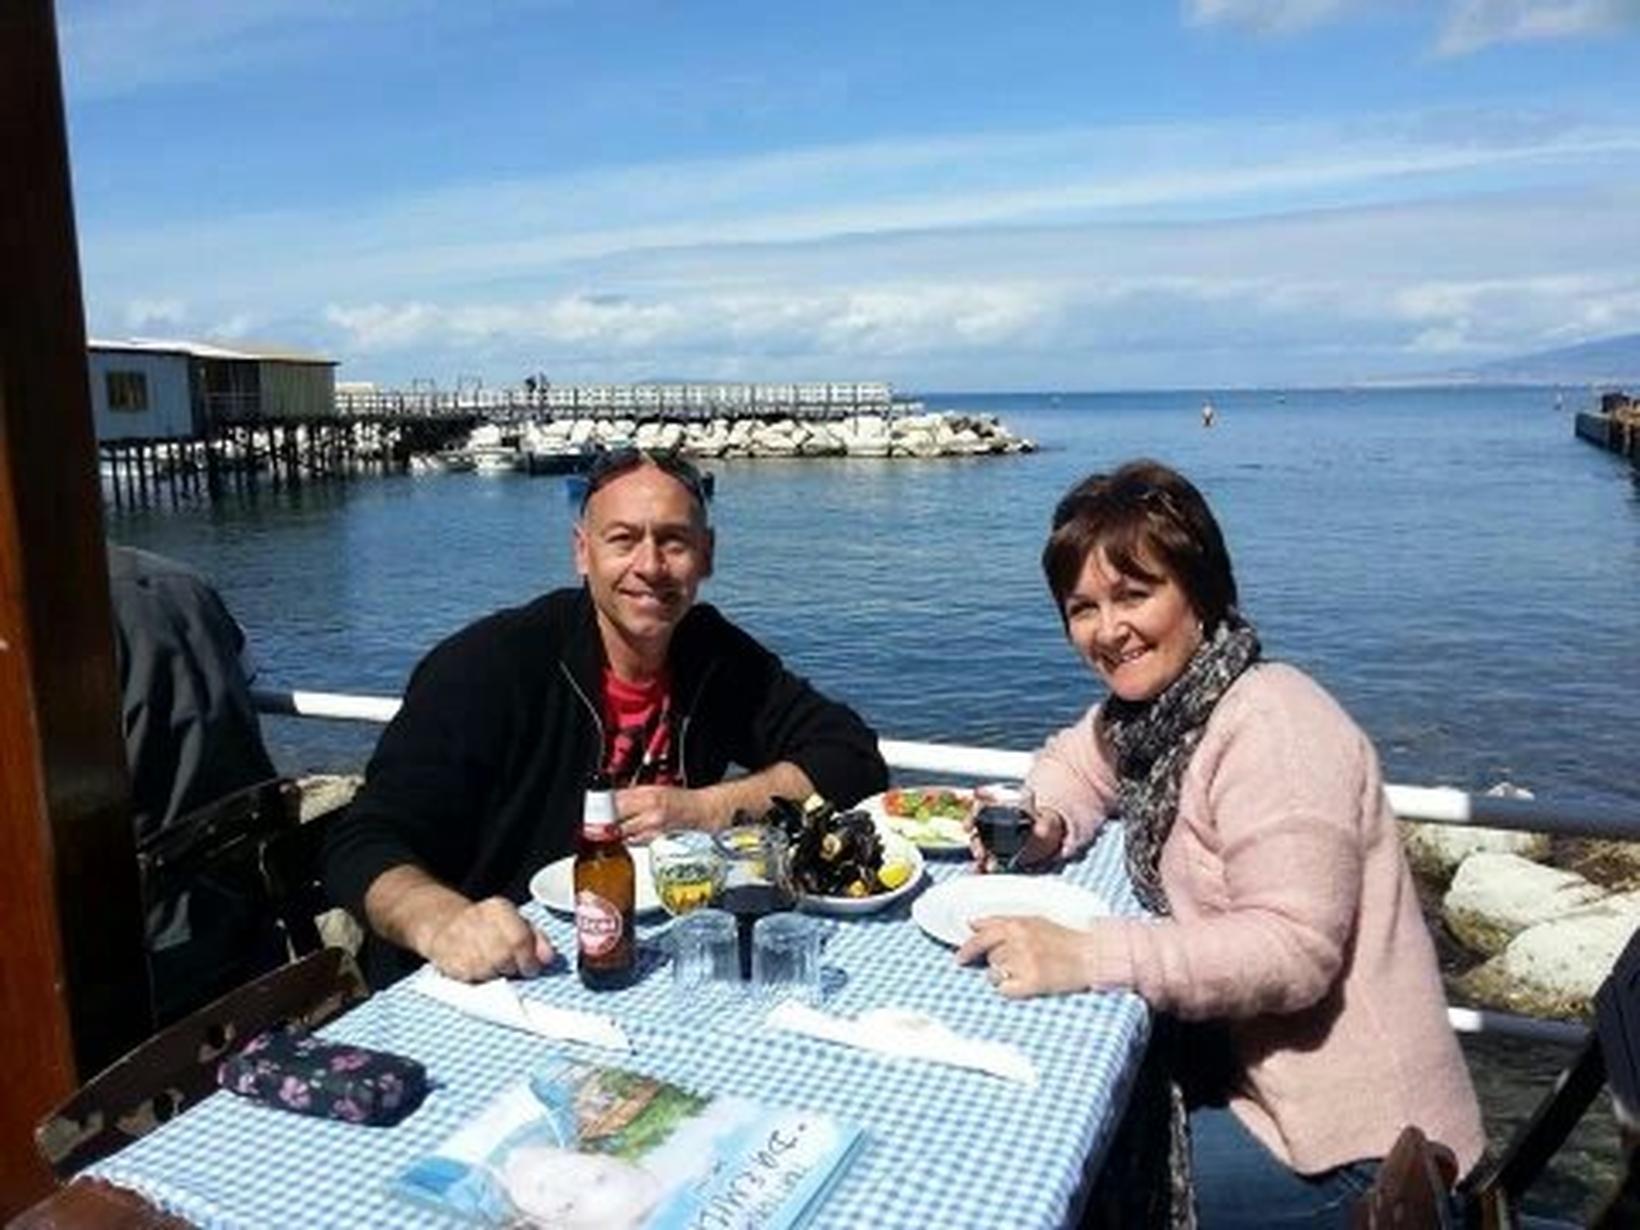 Lesley & Paul from Mellis, United Kingdom